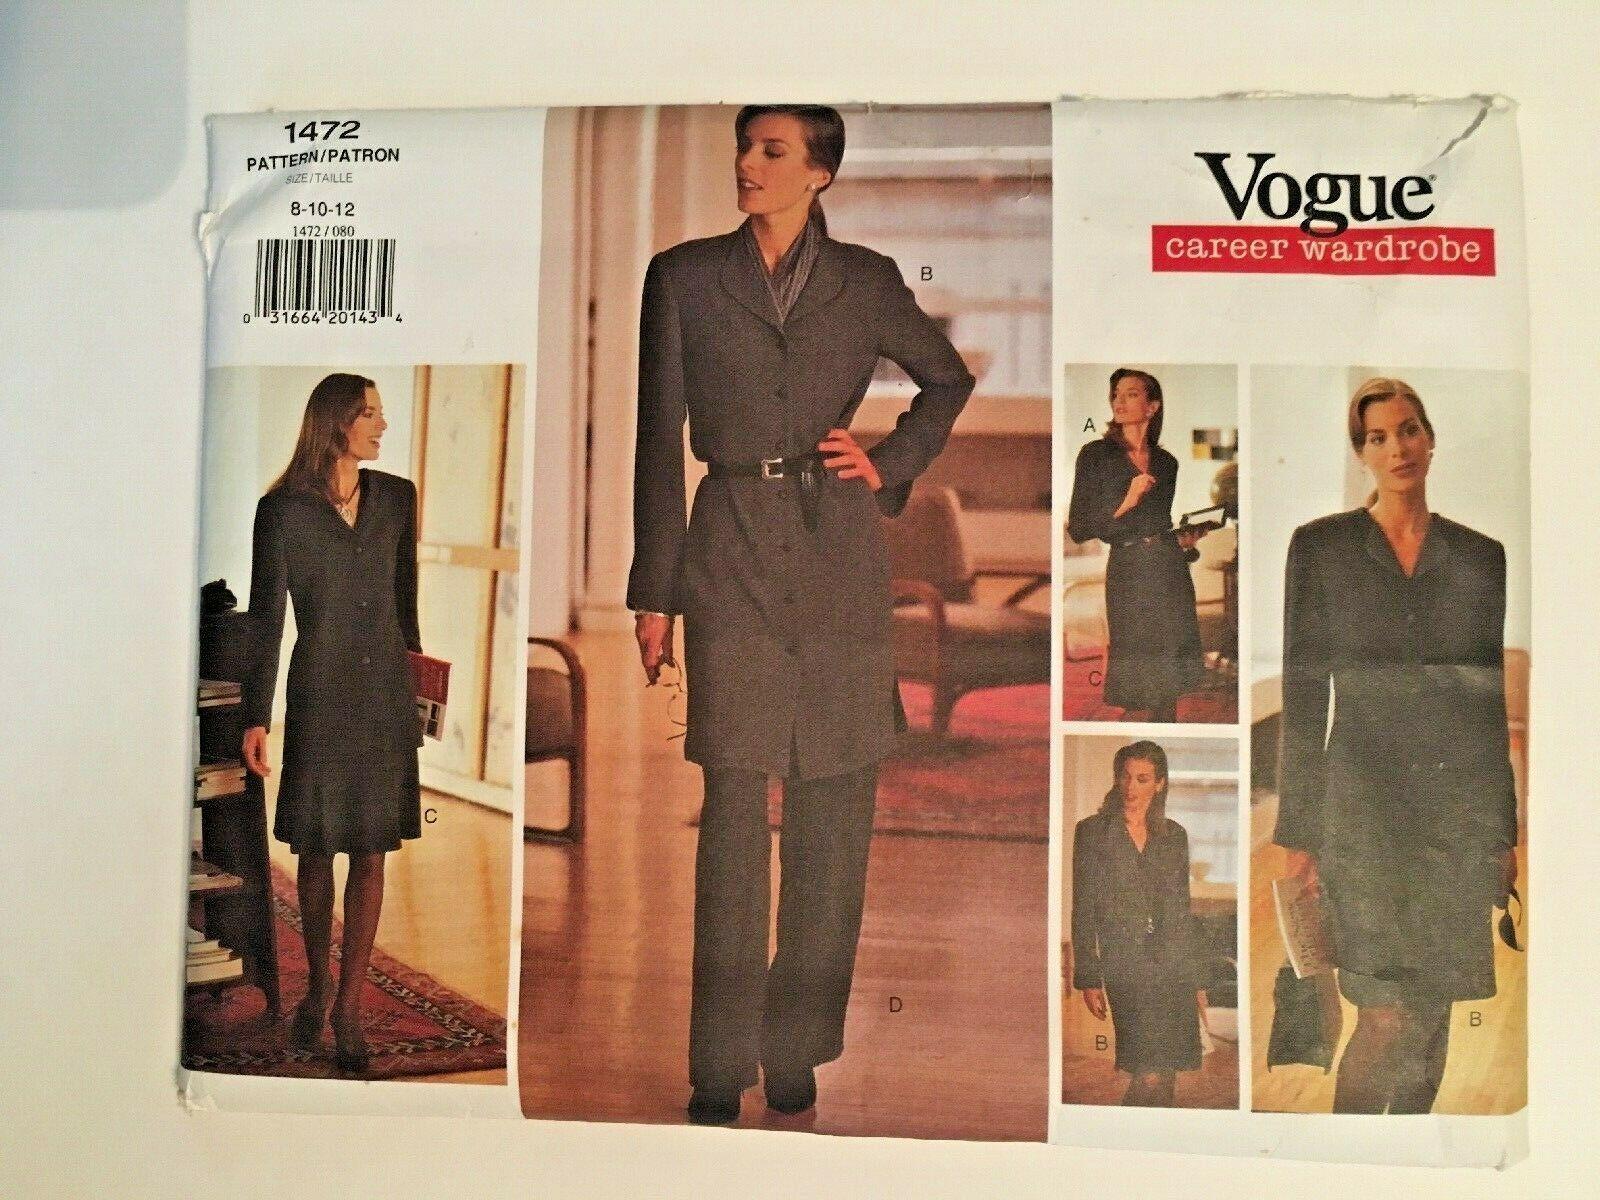 Vogue Sewing Pattern  # 1472 SZ  8-10-12 Dress ,Jacket, Pants, Skirt. Uncut